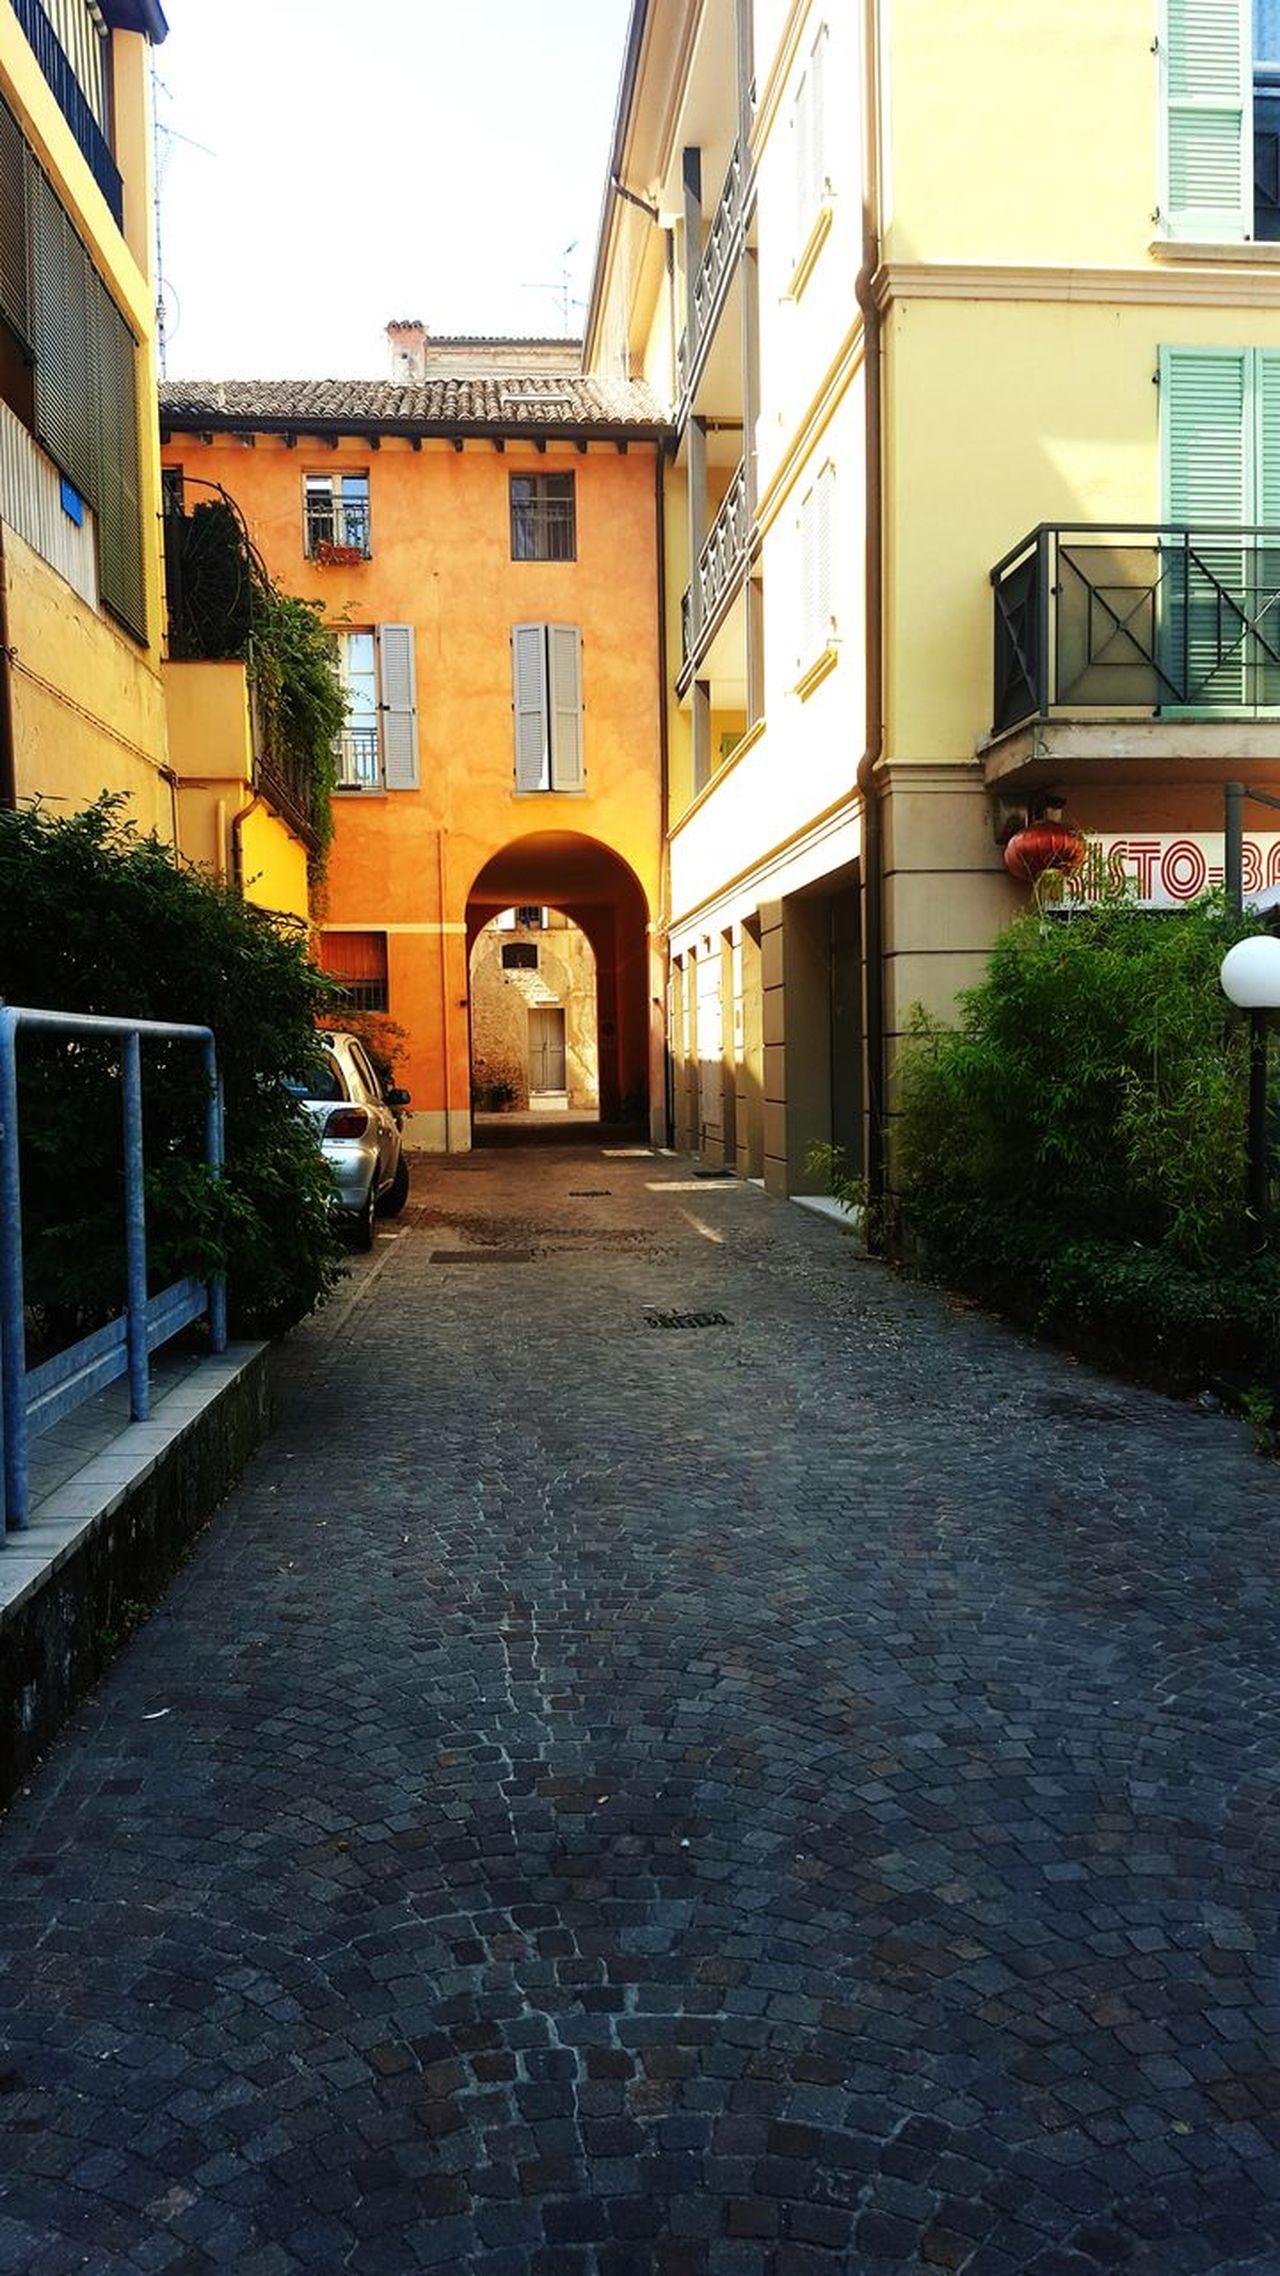 Old Vintage Buildings Italy Summer